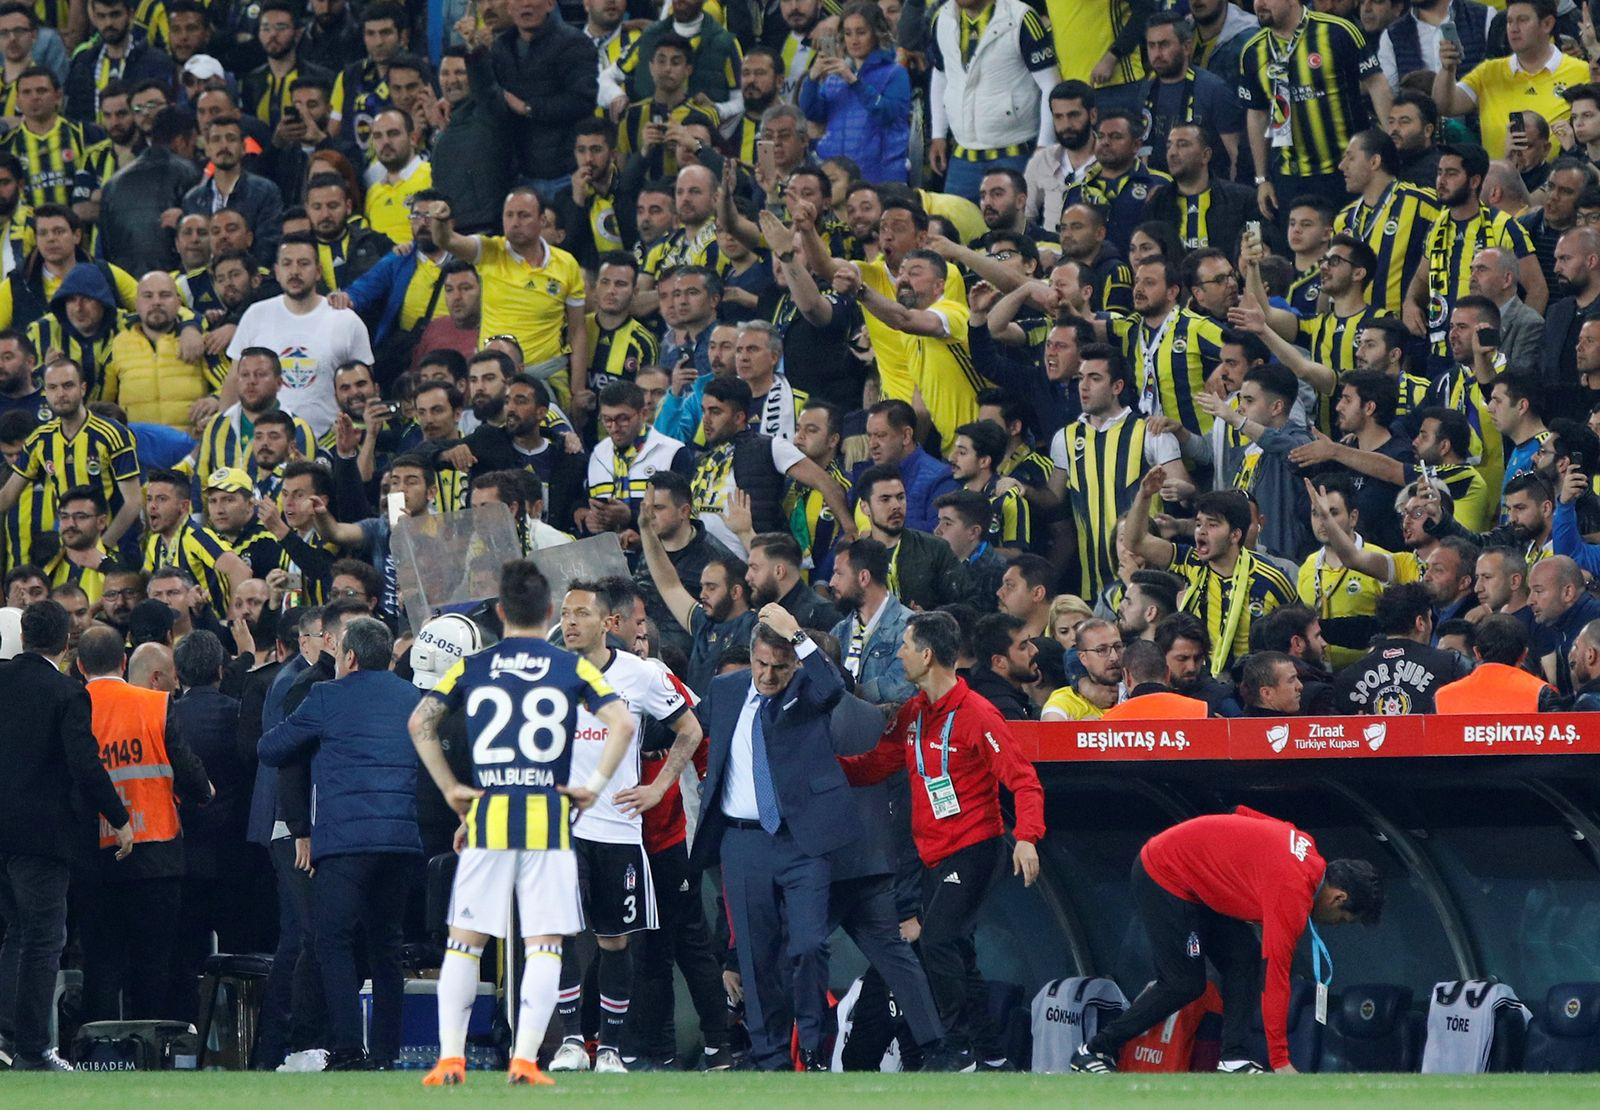 SOCCER-TURKEY/ABANDONMENT